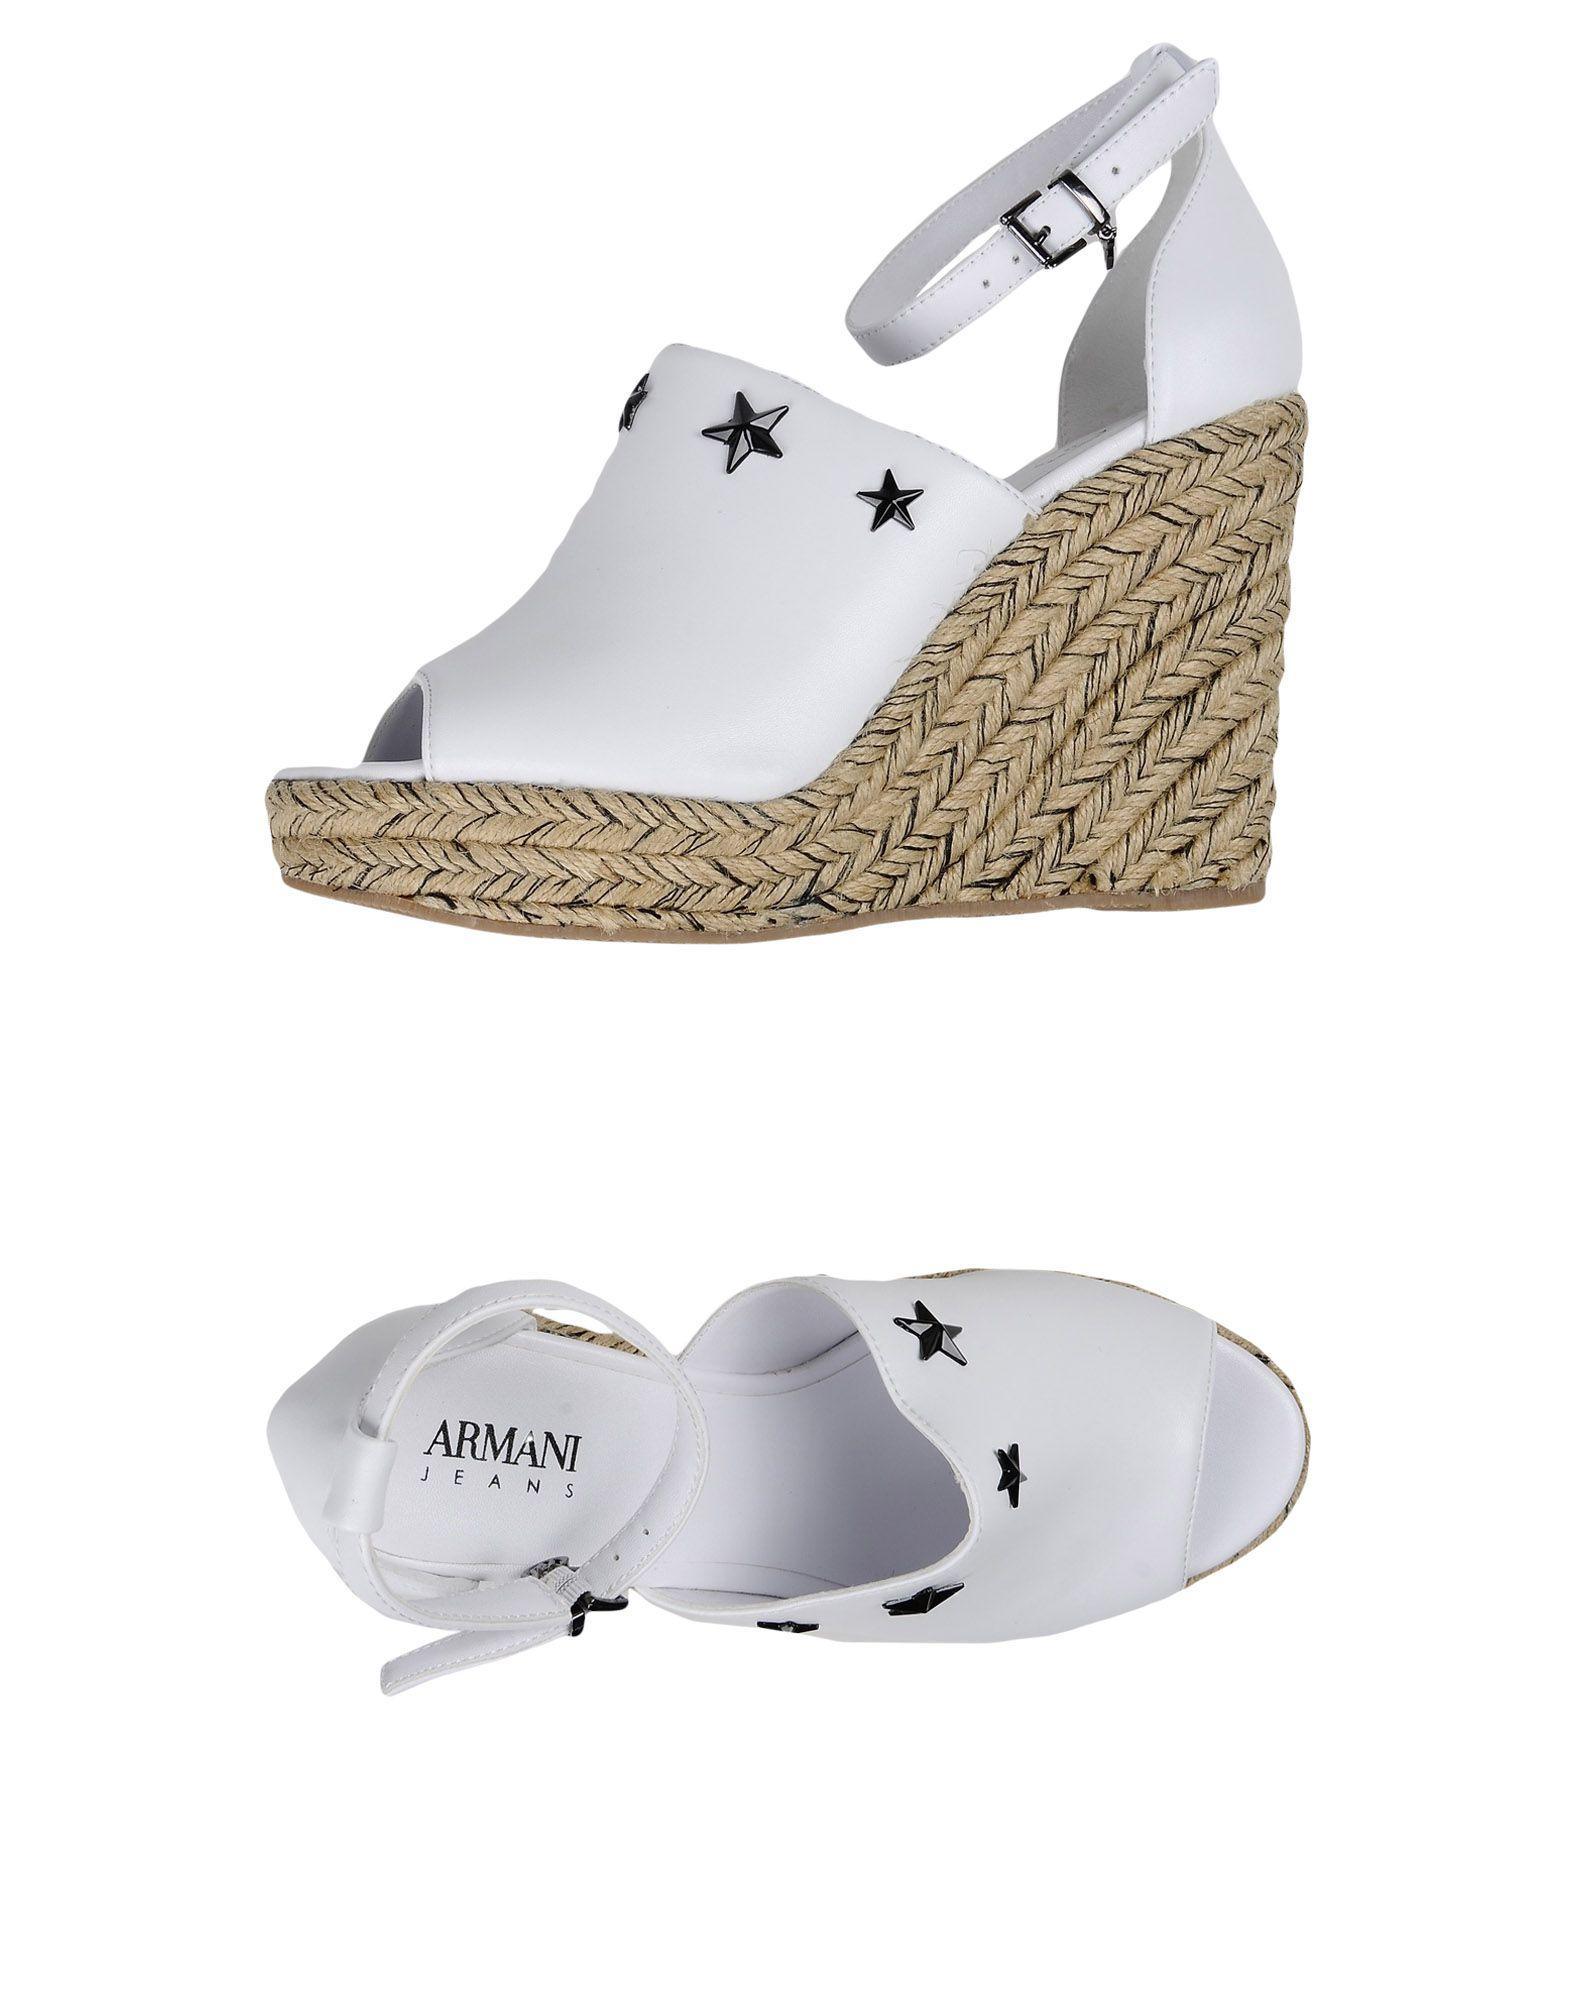 Armani Jeans Espadrilles In White